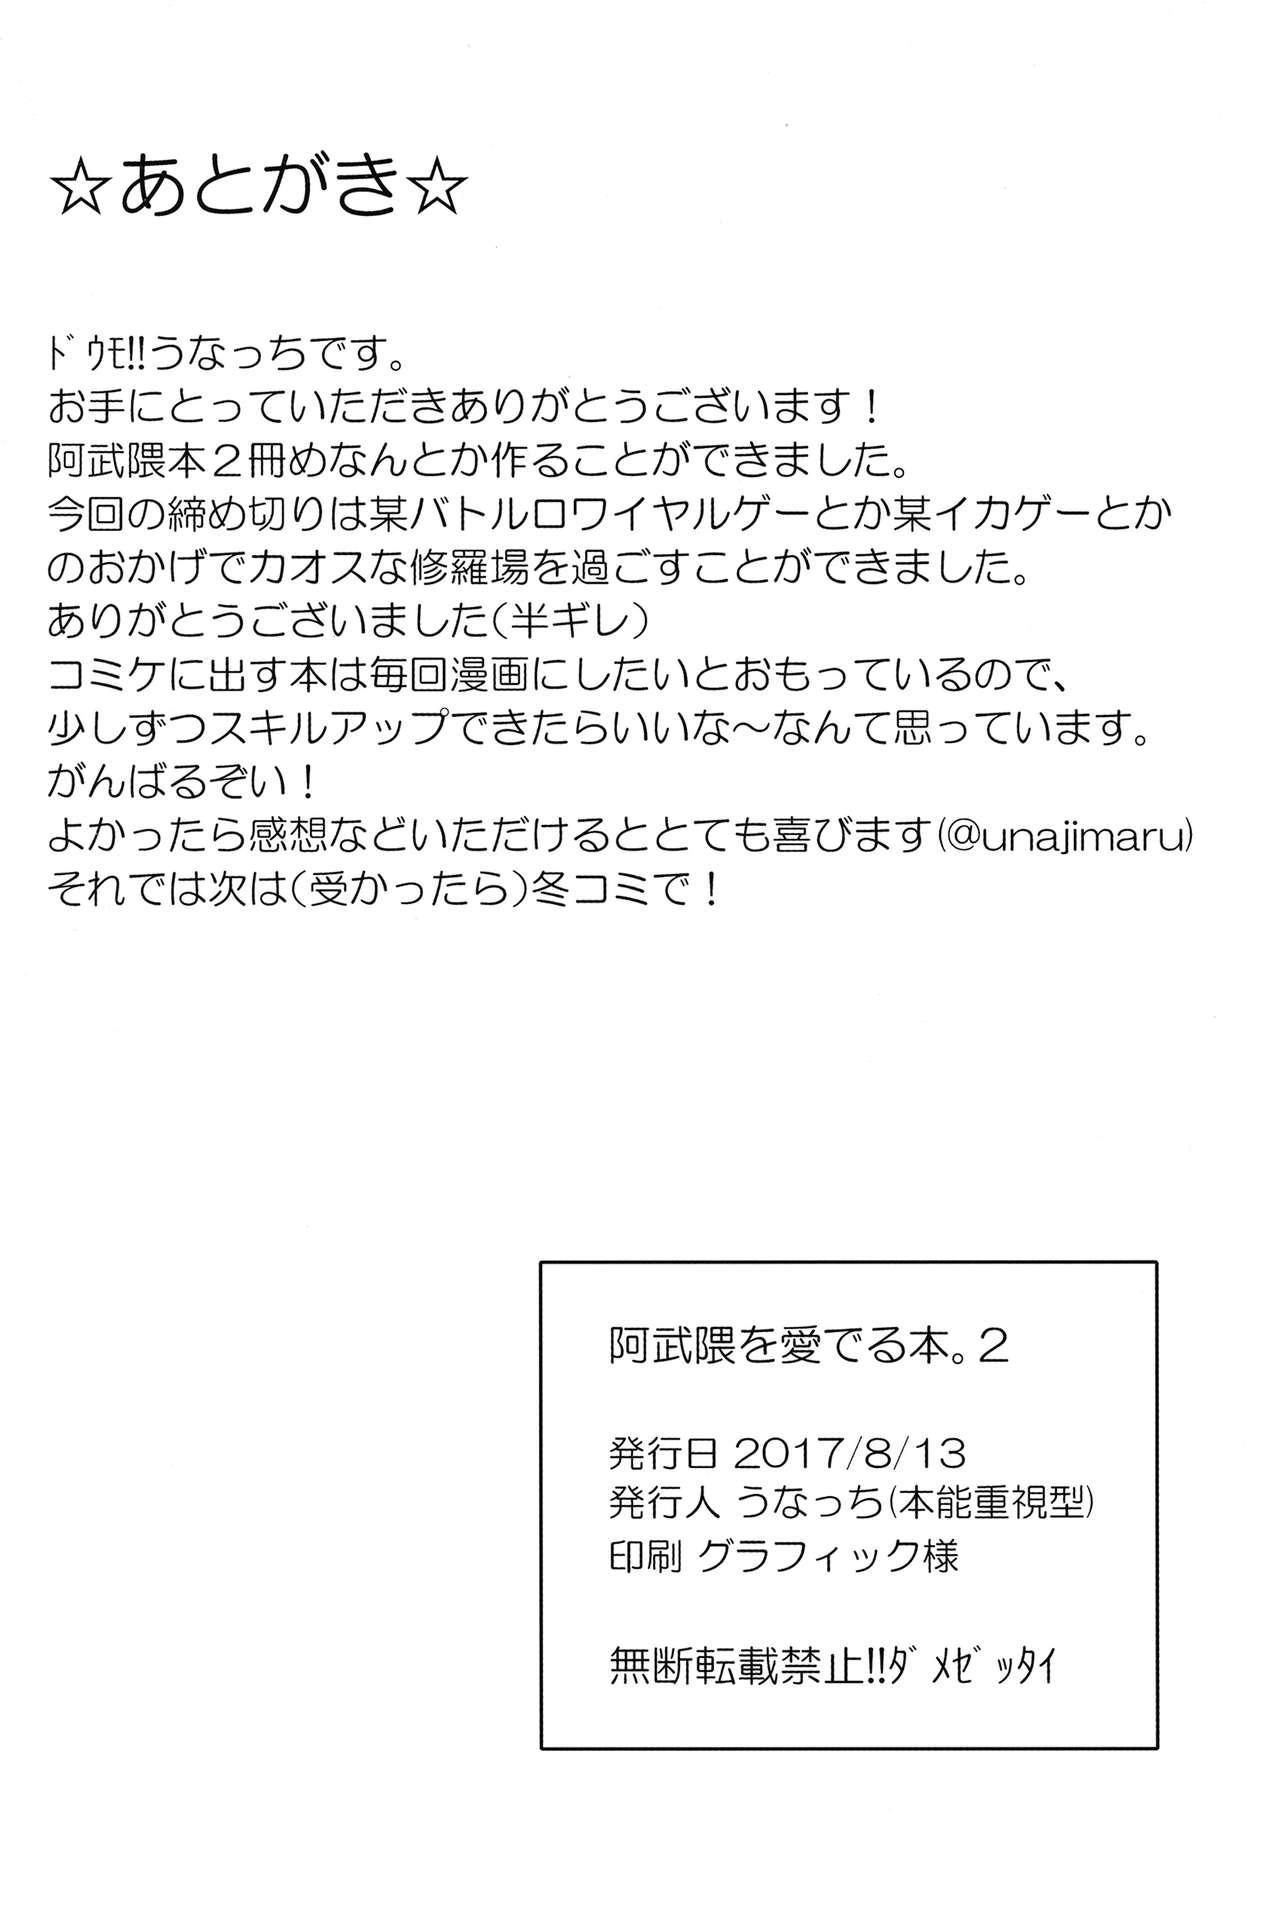 Abukuma o Mederu Hon. 2 20